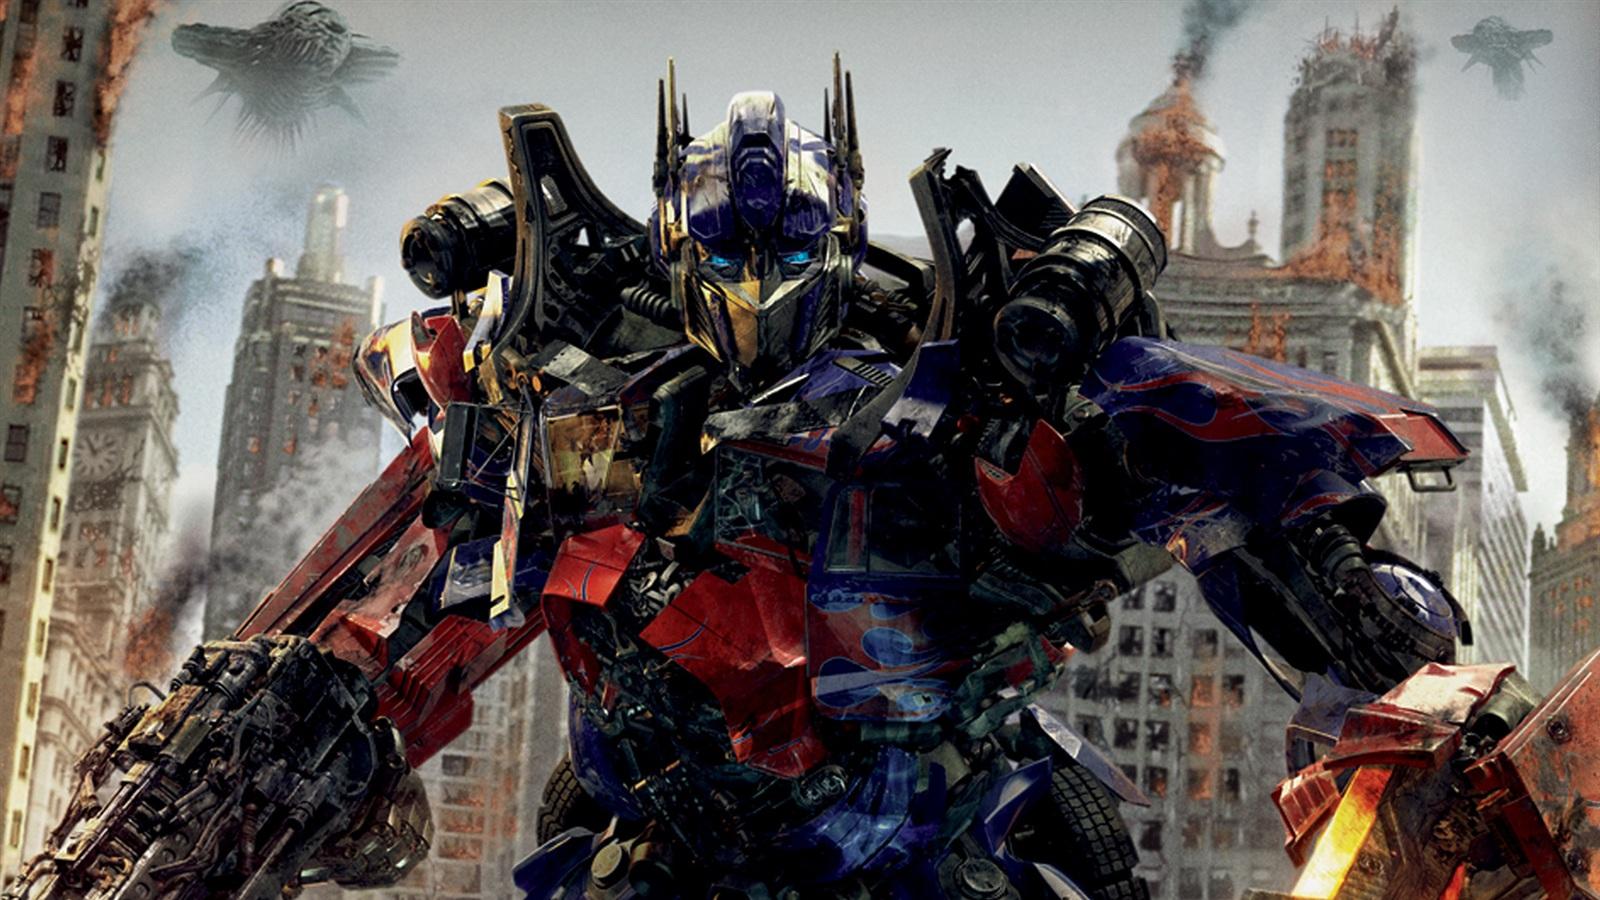 Transformers | henryherz.com